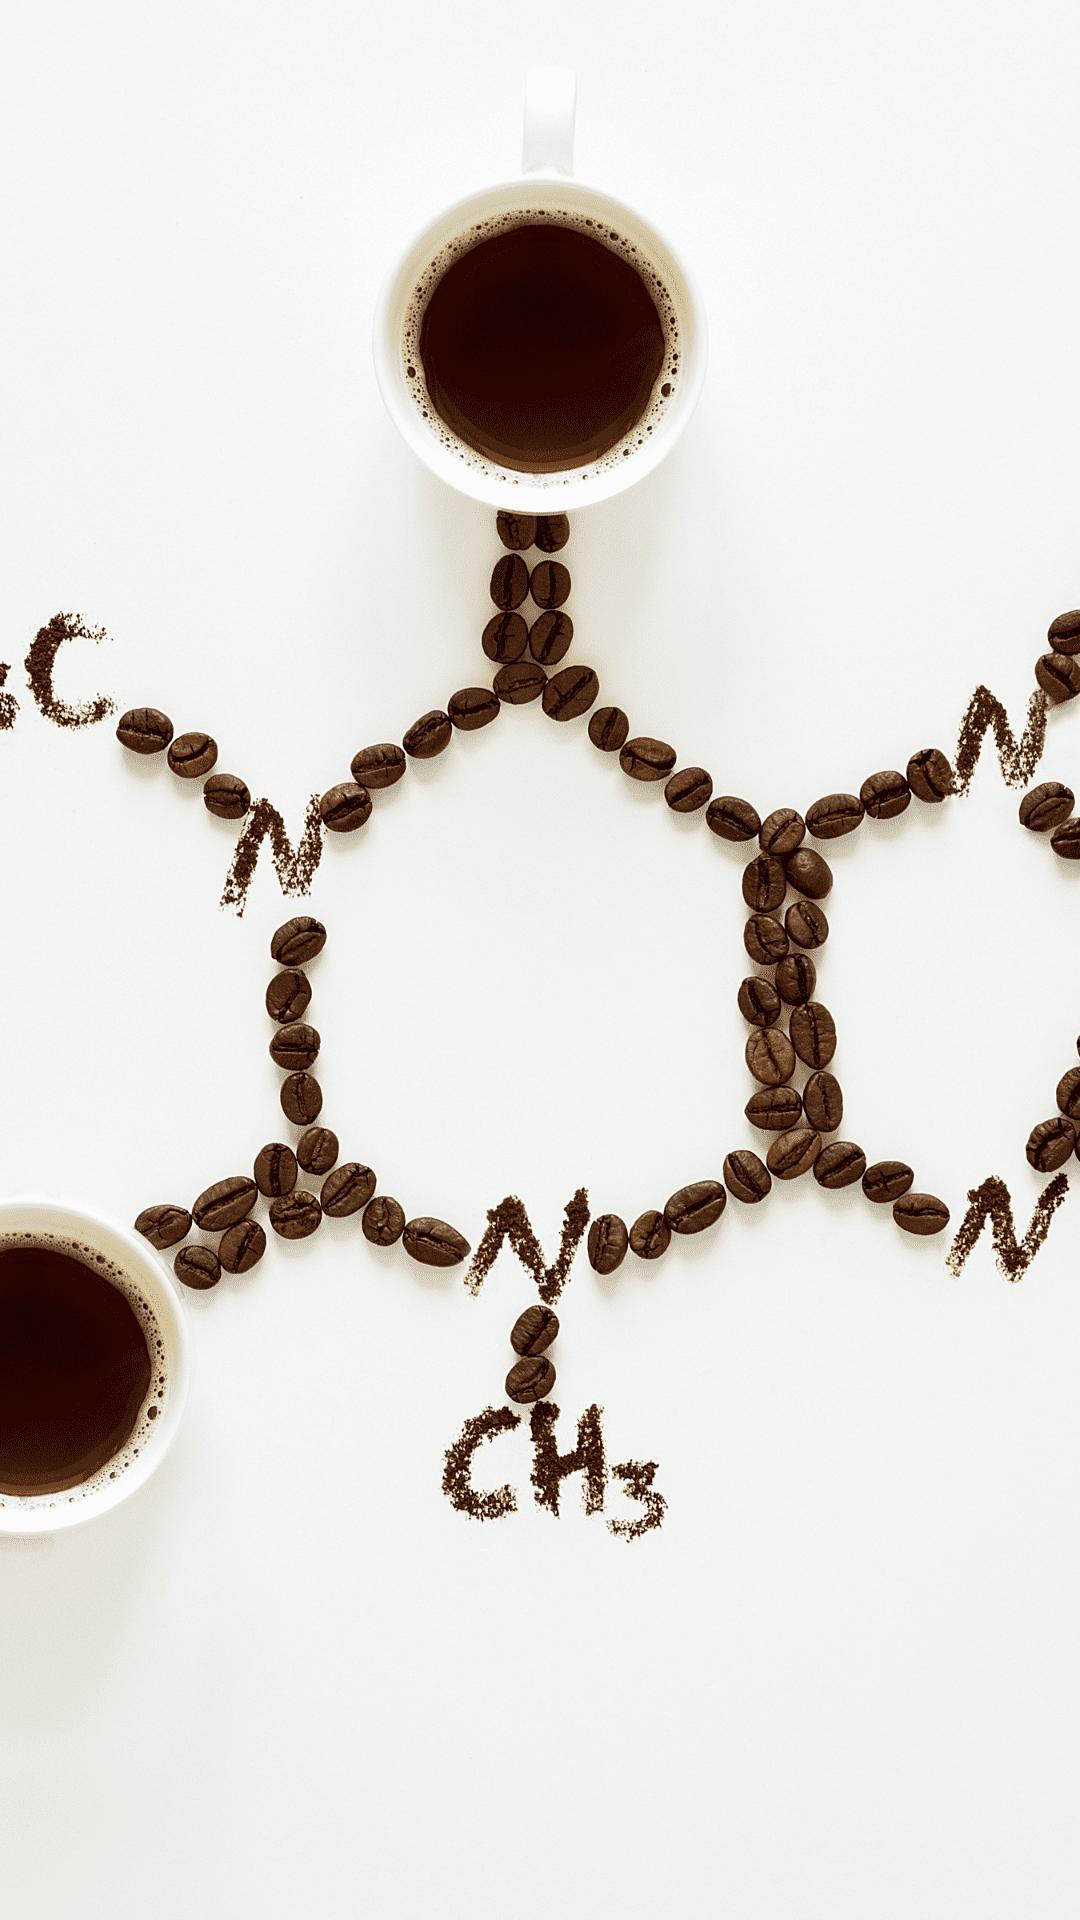 How caffeine can help with hair loss